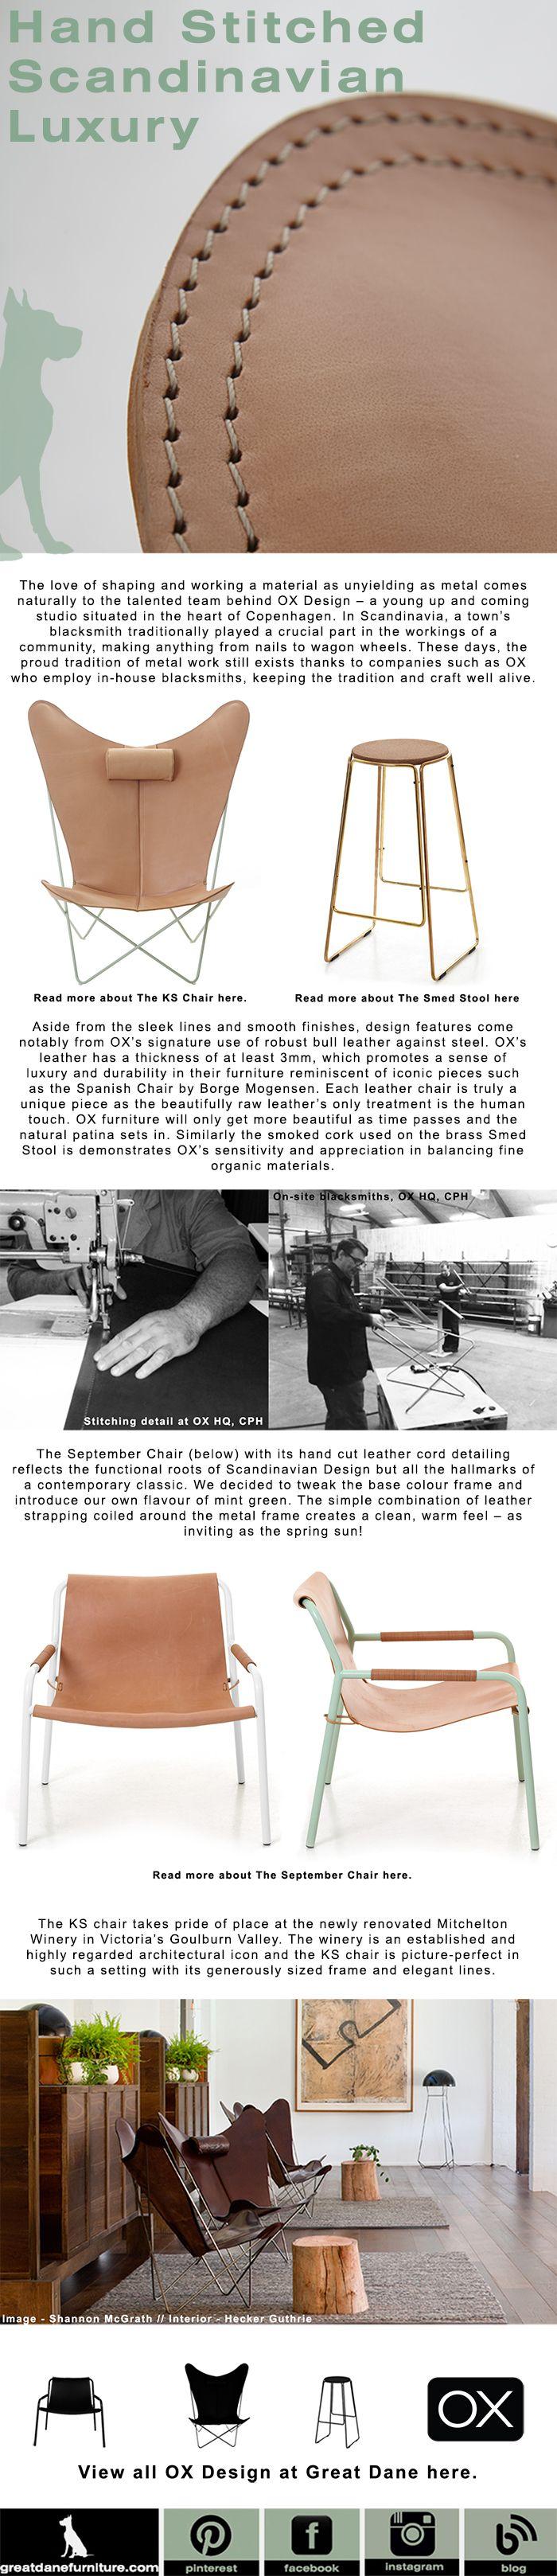 Hand Stitched Scandinavian Luxury